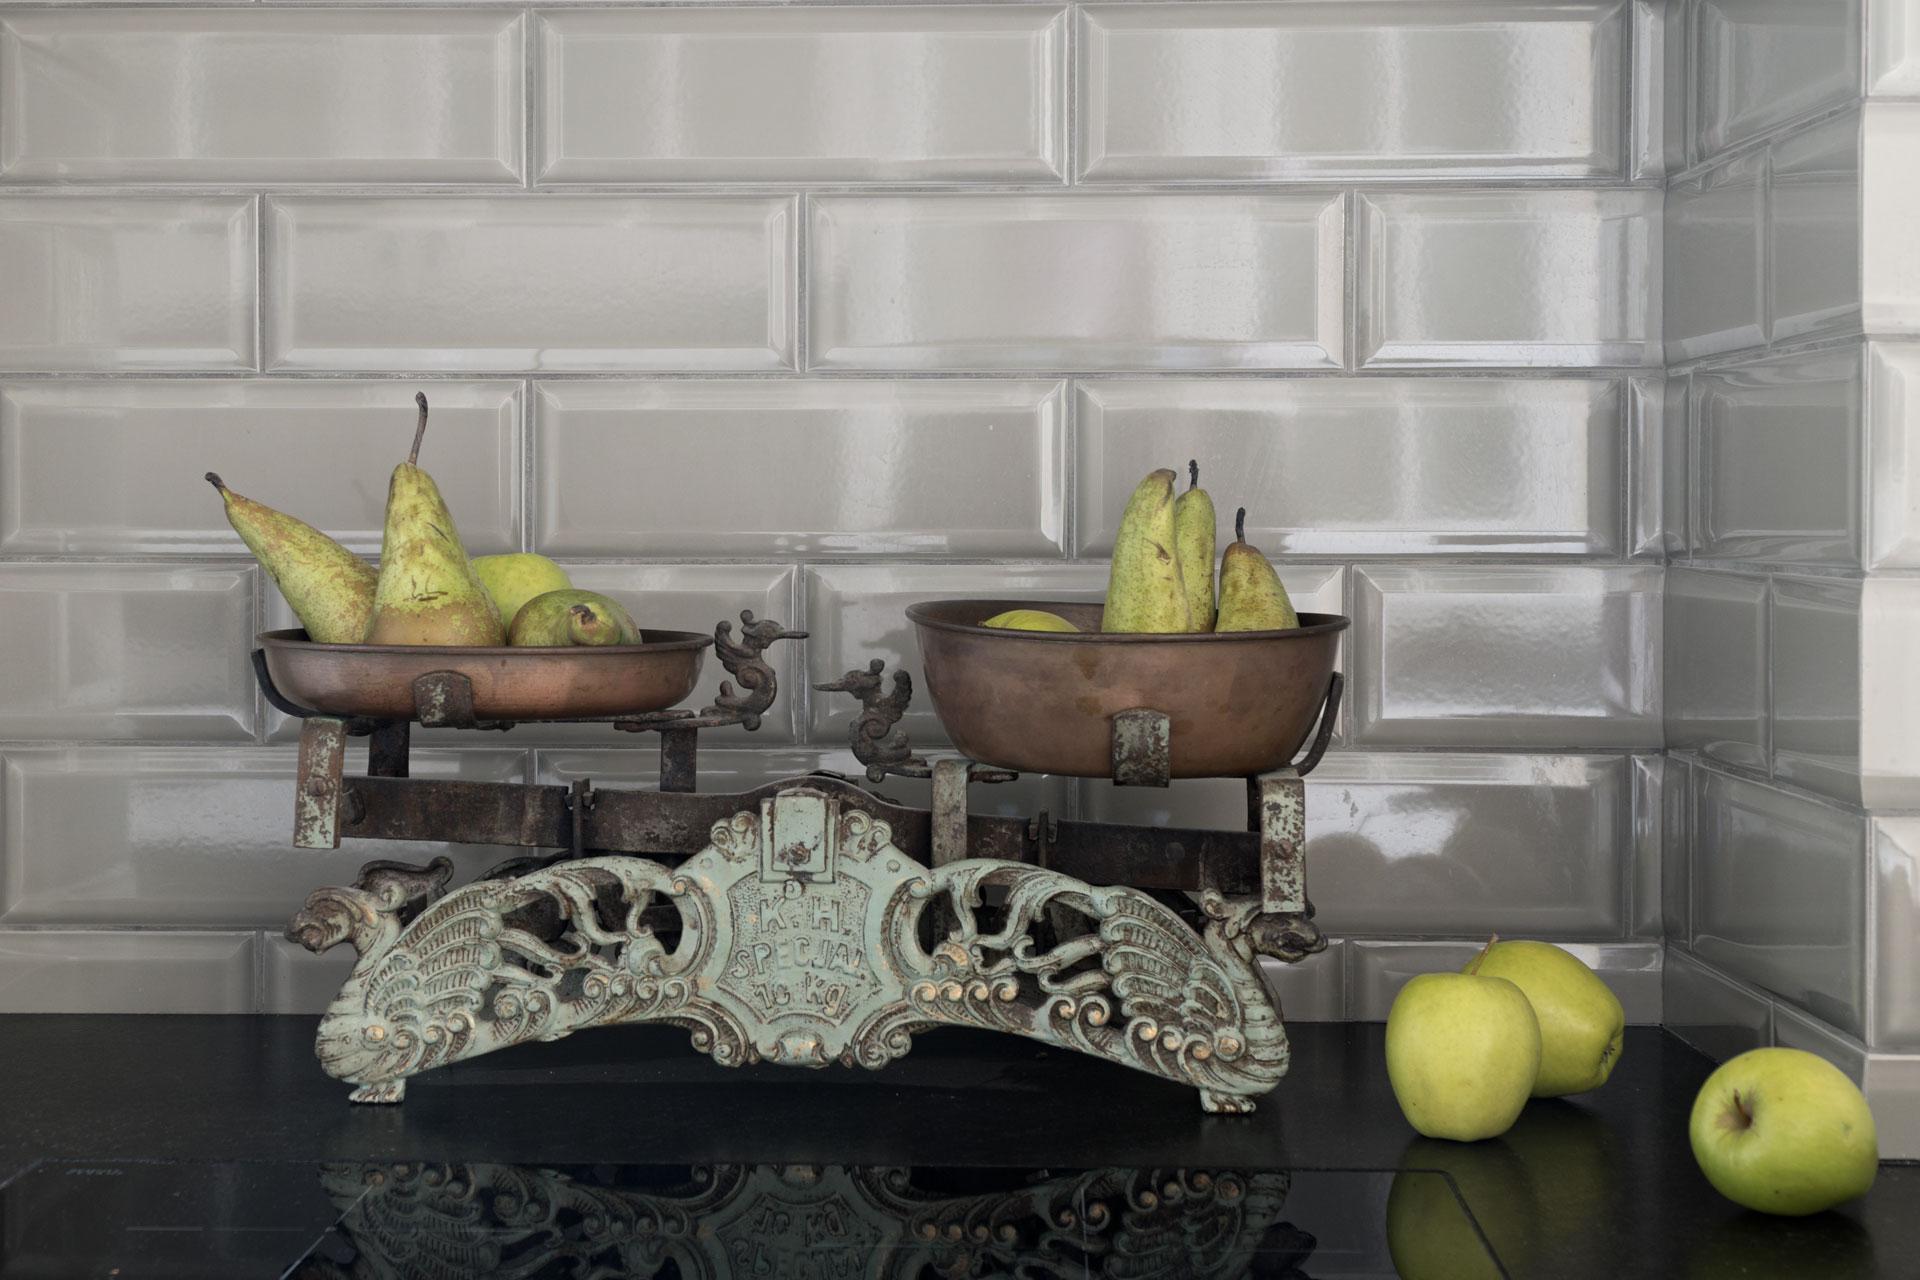 s_waga-szeroki-plan-jablka-gruszki-centralnie